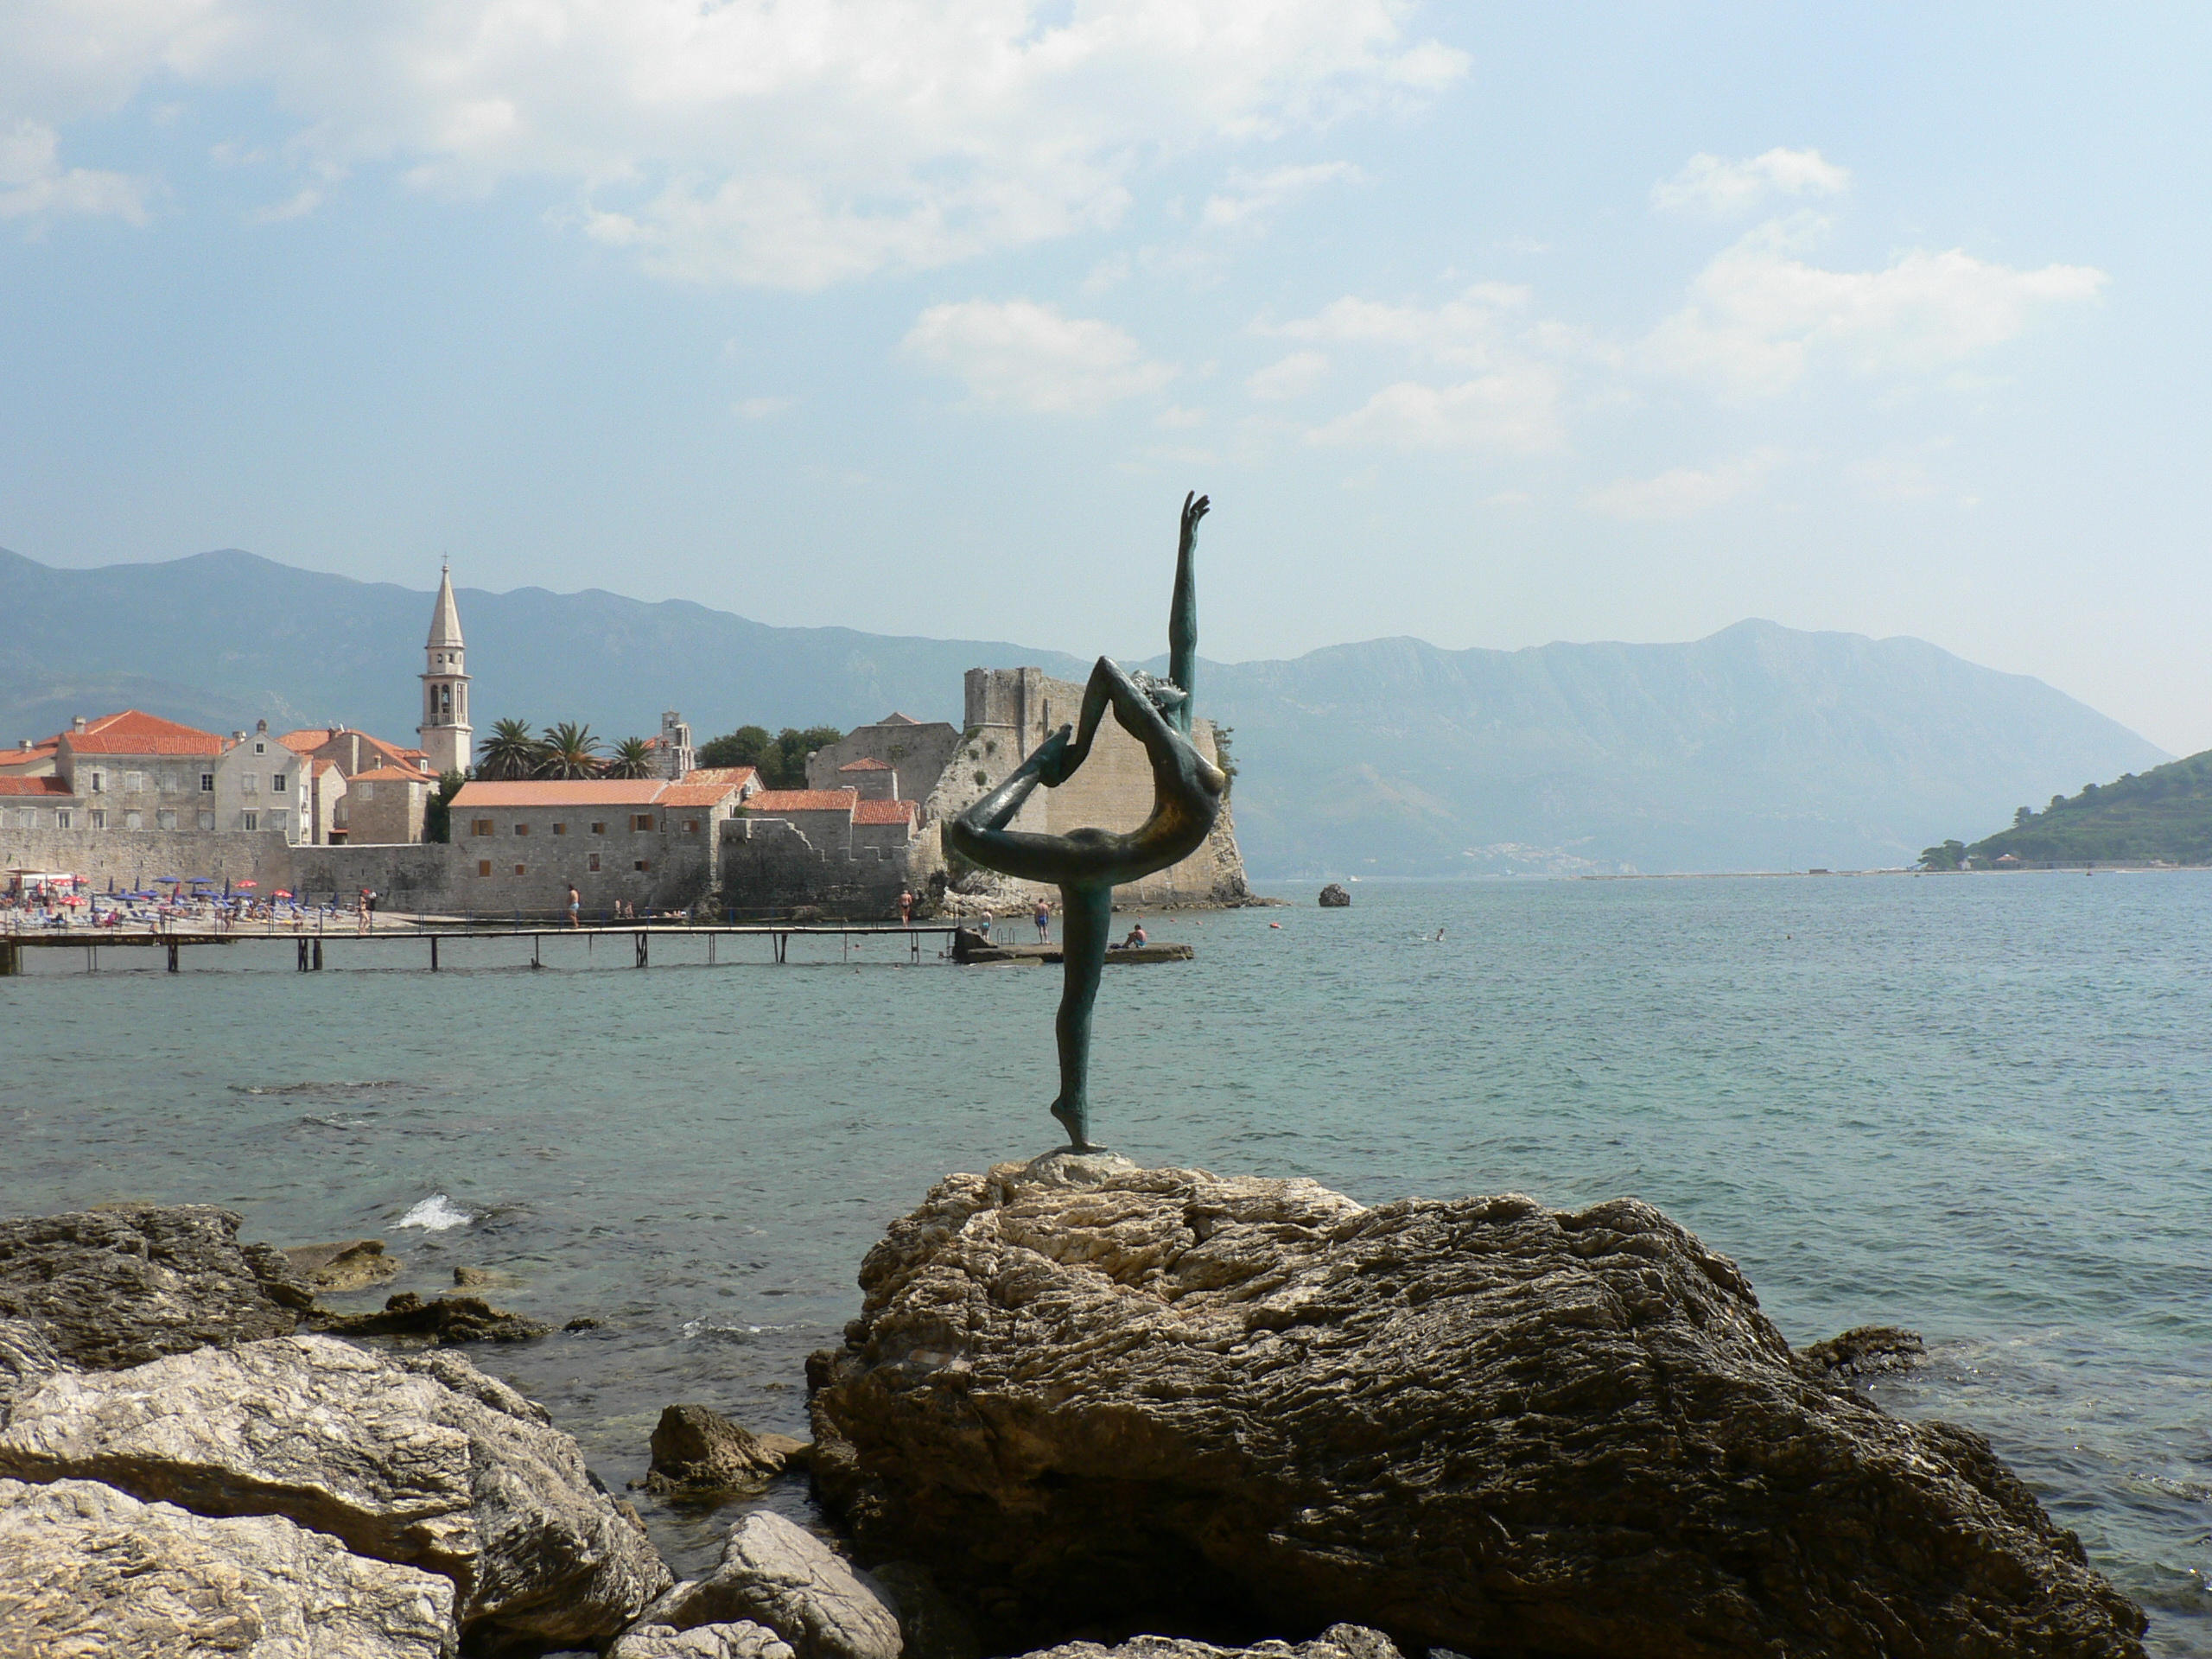 http://fc04.deviantart.net/fs7/i/2005/251/0/e/Budva_Montenegro__6_by_anhell.jpg